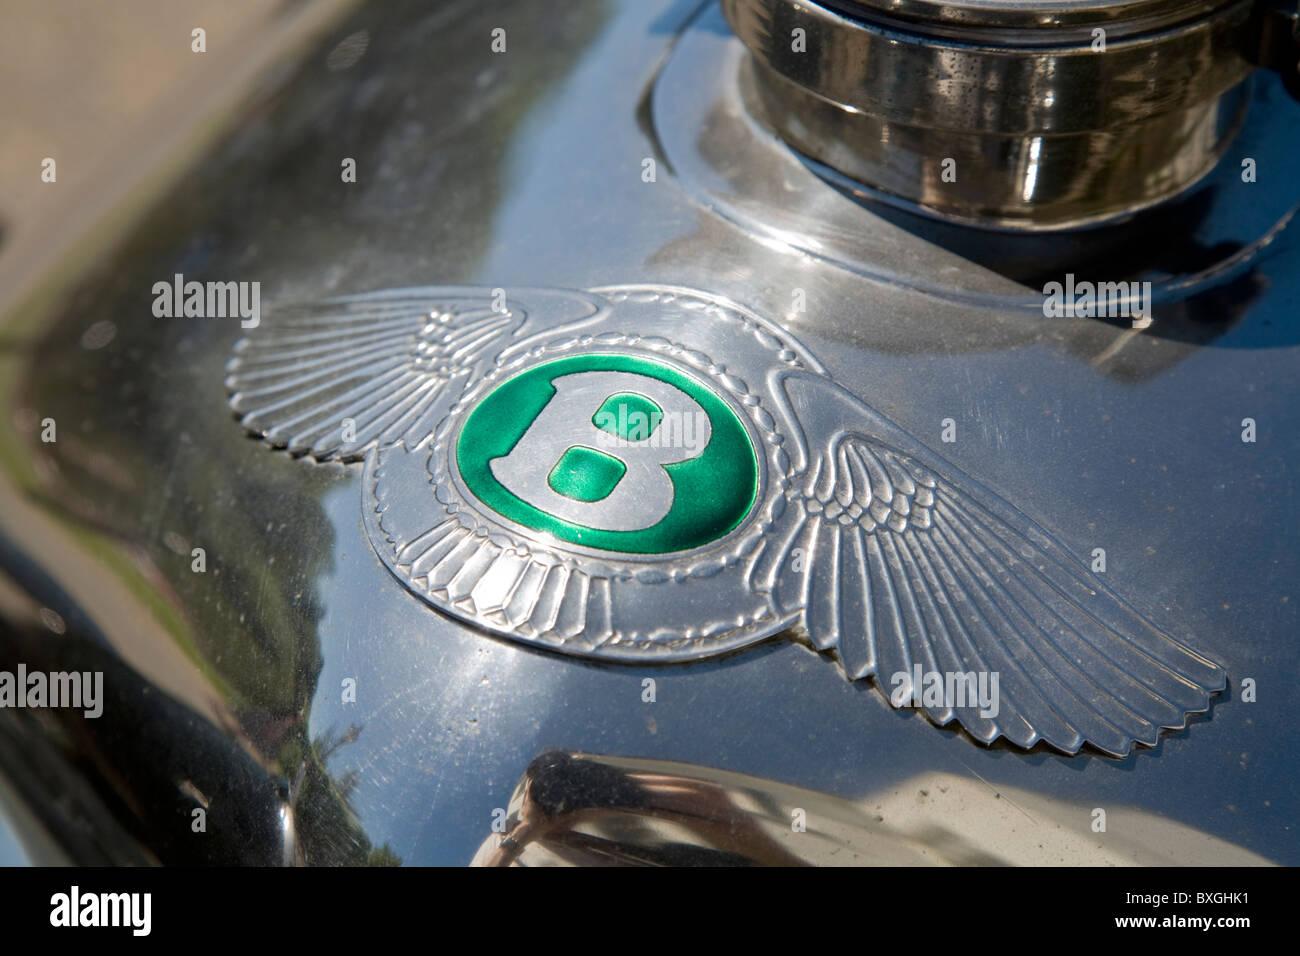 Vintage Bentley B Car Badge Radiator Grille Logo Insignia On A Stock Photo Alamy